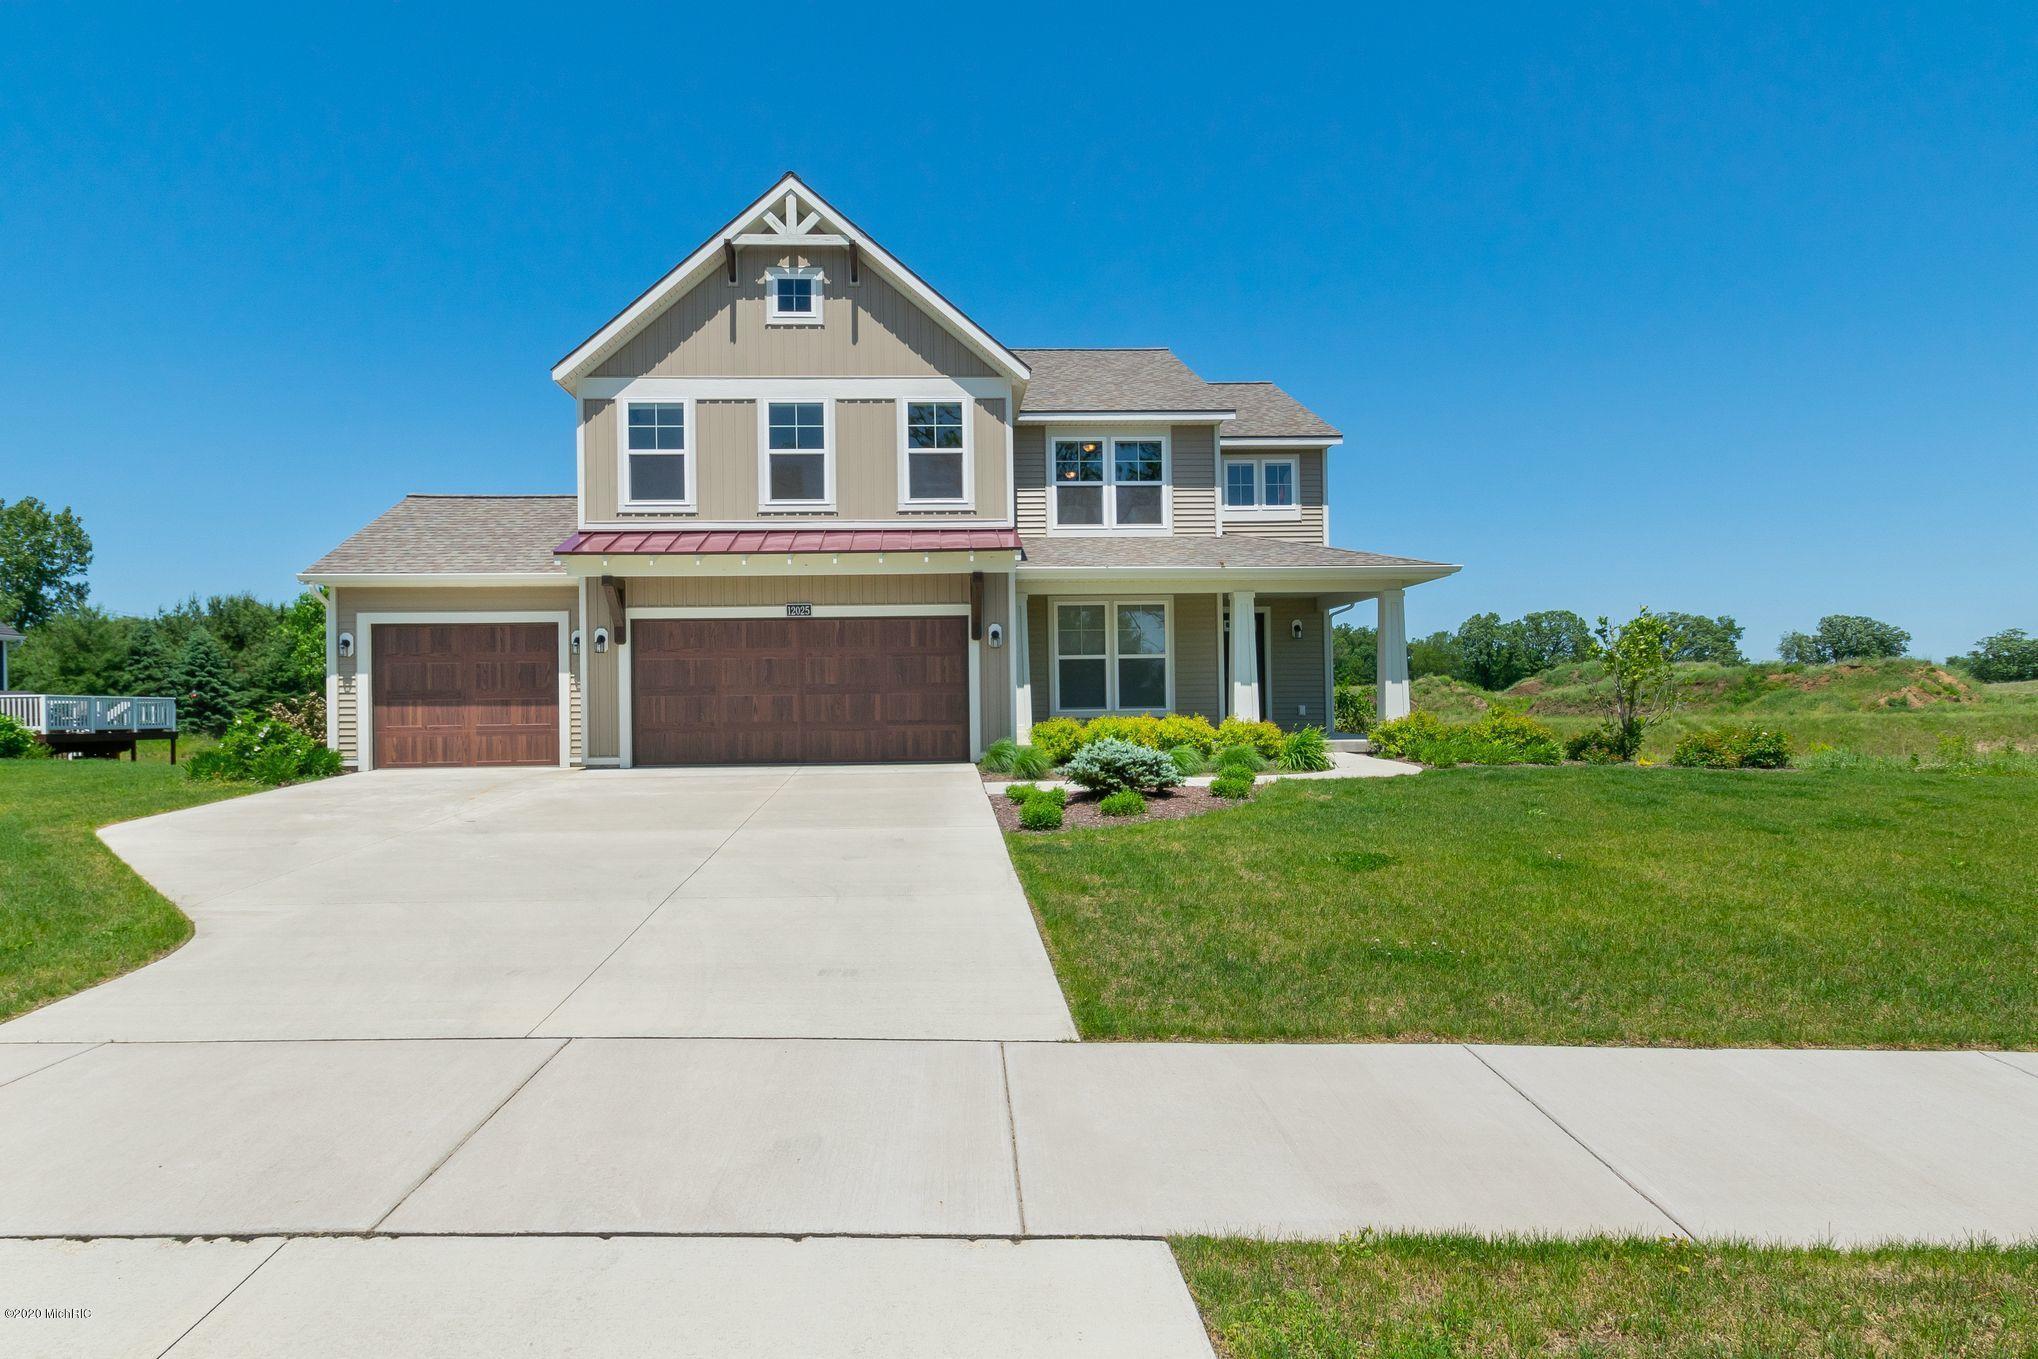 12025 Harvest Home Drive, Lowell, MI 49331